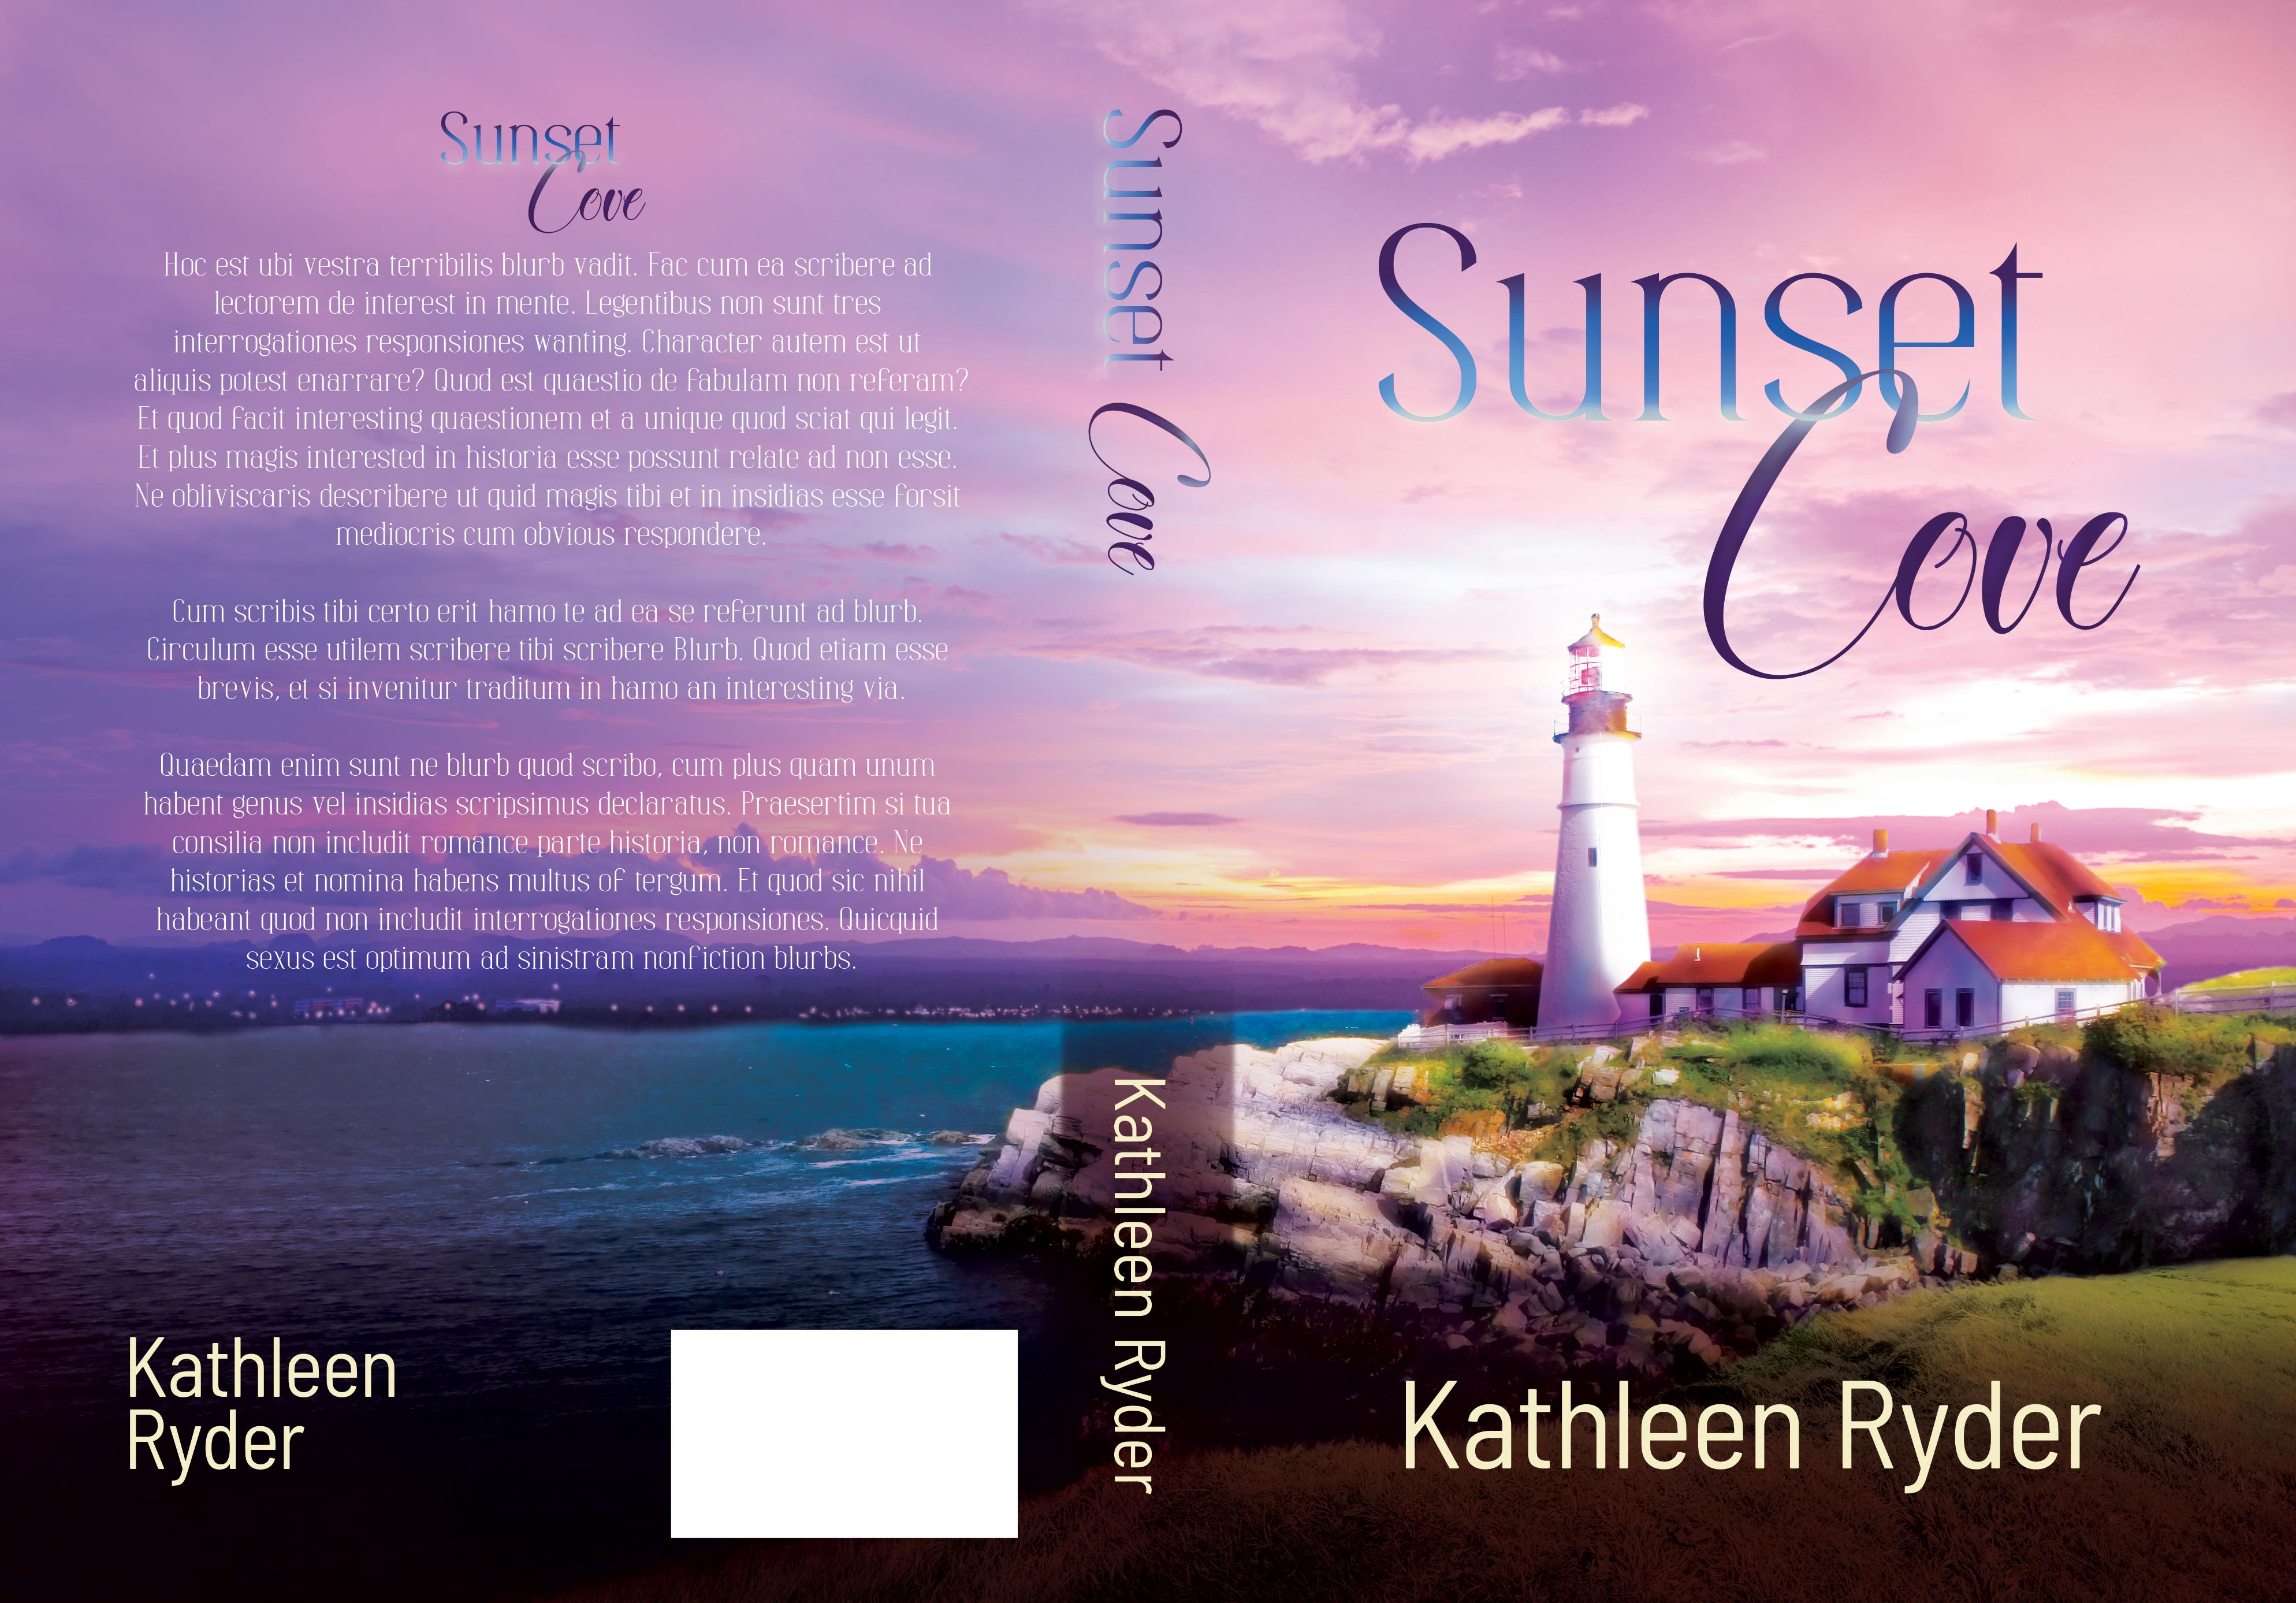 Sunset-Cove_Kathleen-Ryder_paperback_100